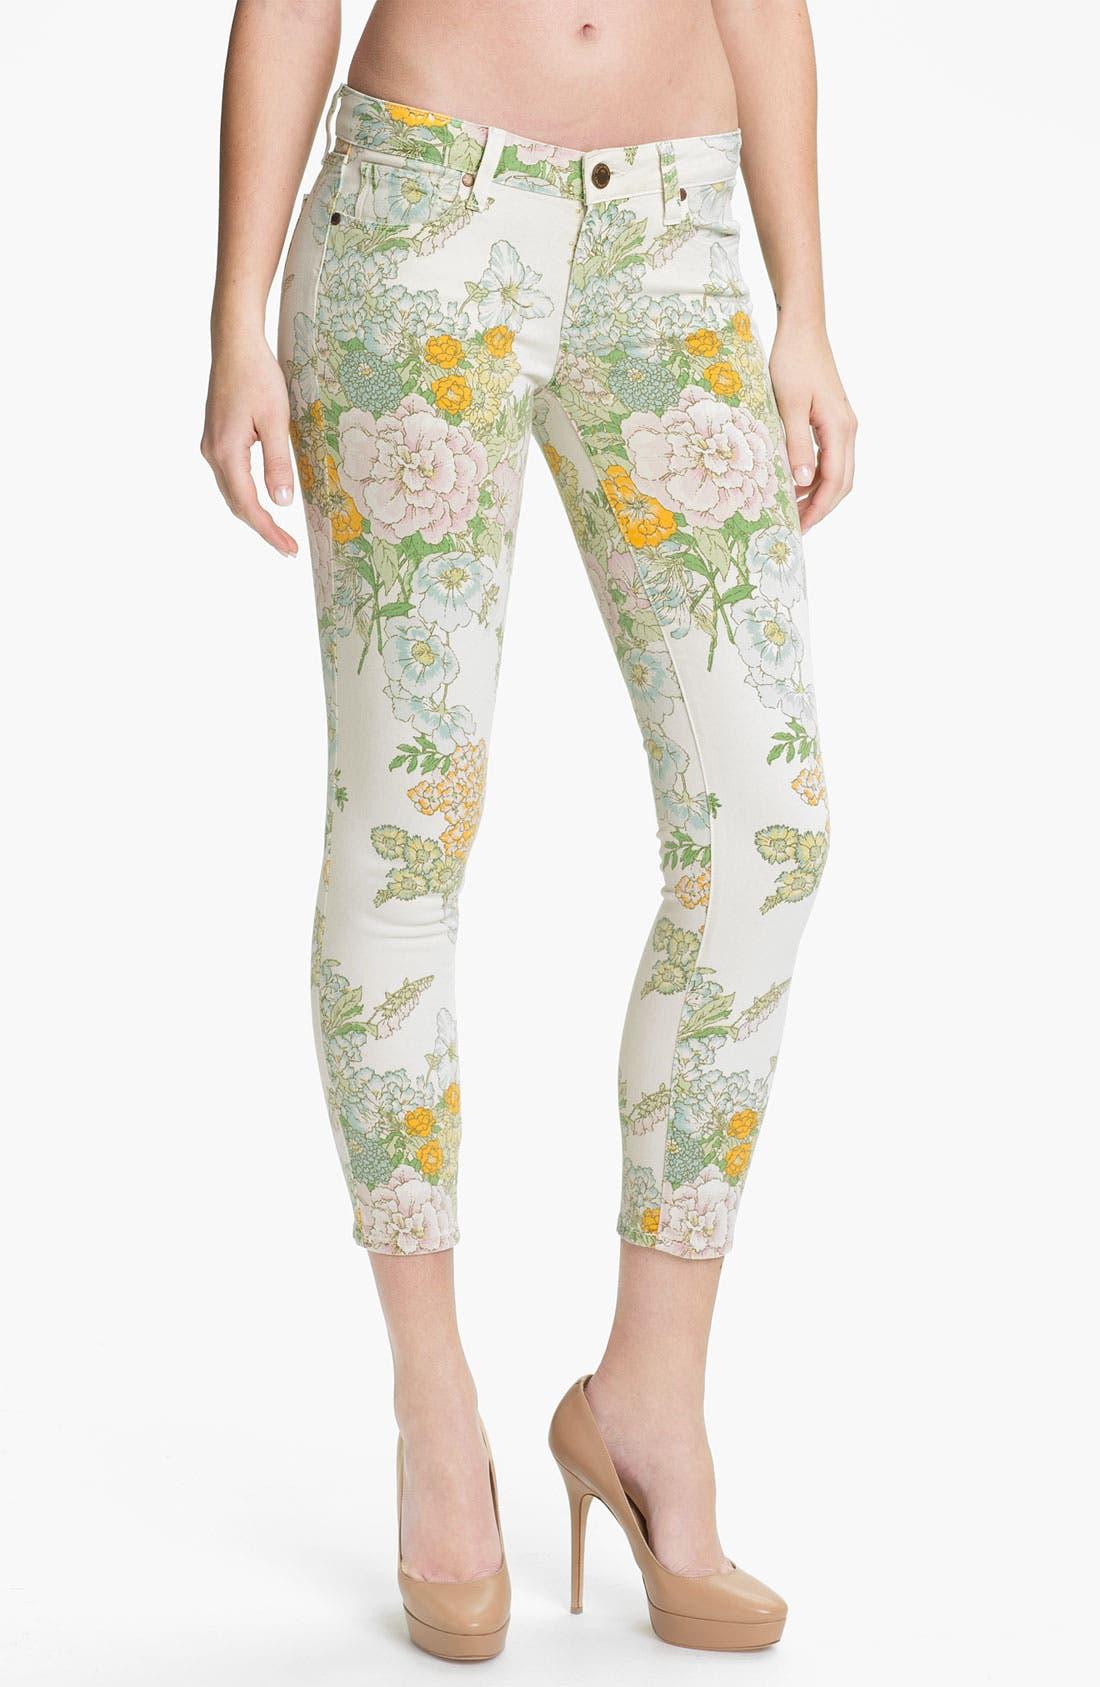 Main Image - Paige Denim 'Verdugo' Print Skinny Jeans (Flea Market Floral)